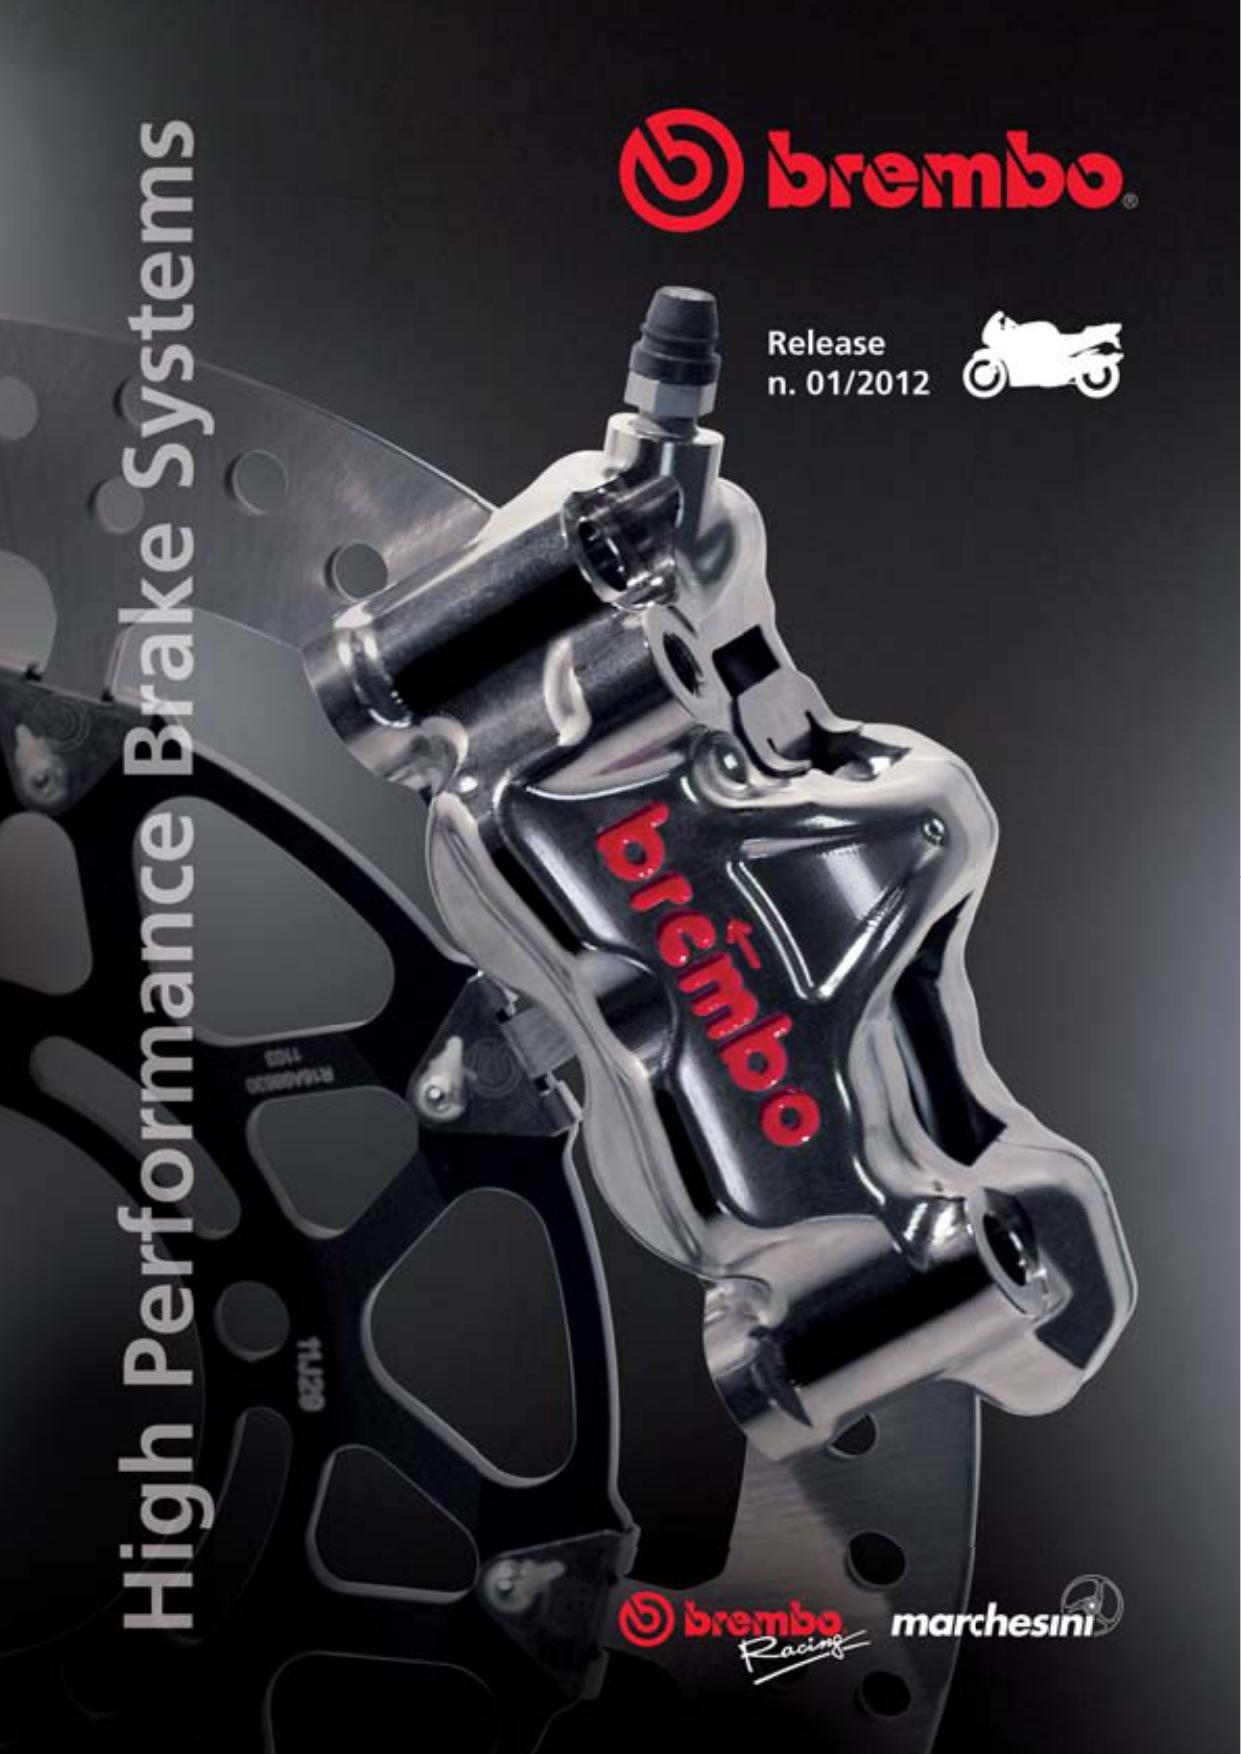 110A26310 POMPA FRENO BREMBO RACING RADIALE 19RCS KTM RC8